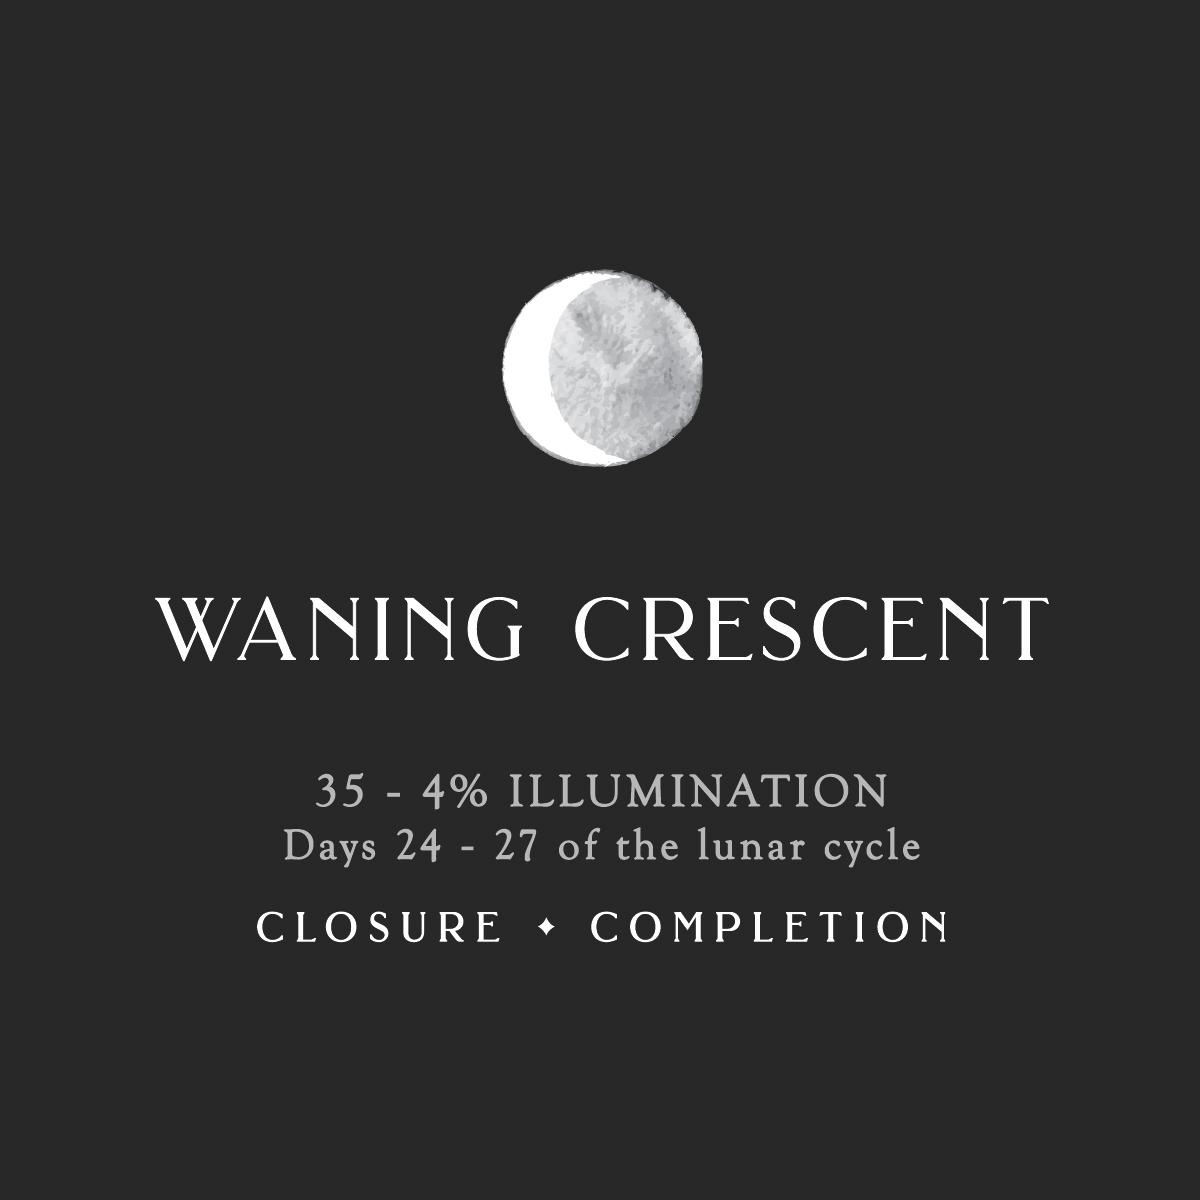 Waning Crescent.jpg